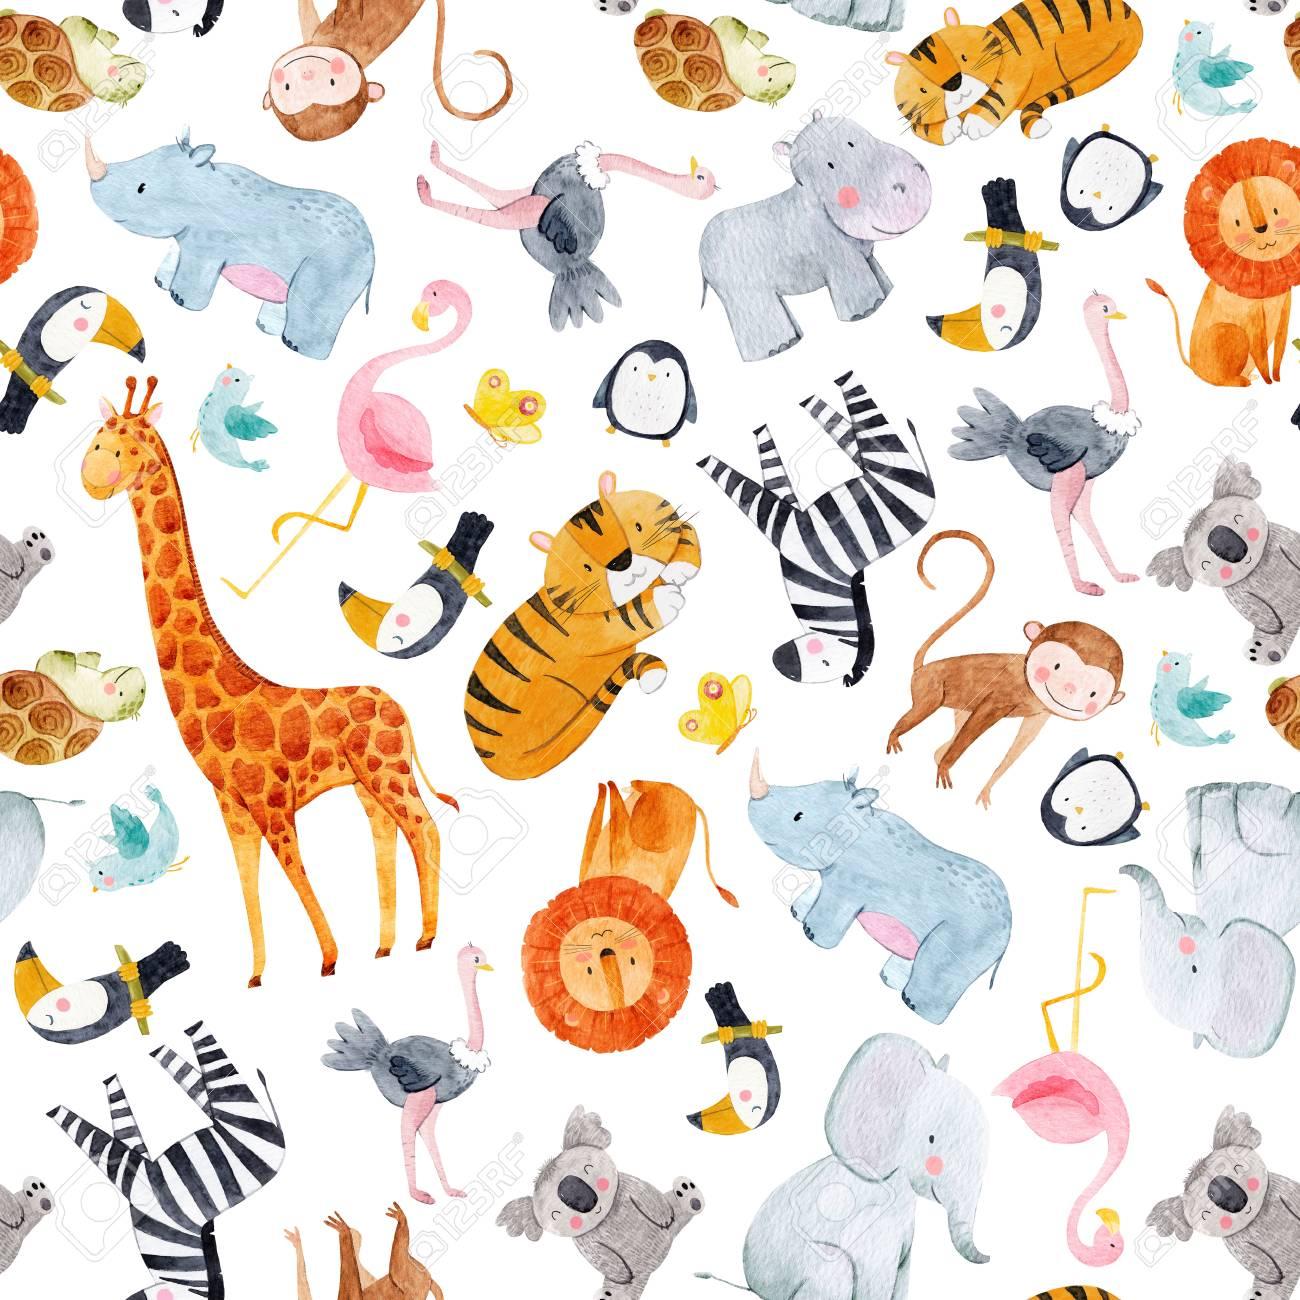 Safari animals watercolor pattern - 101537471